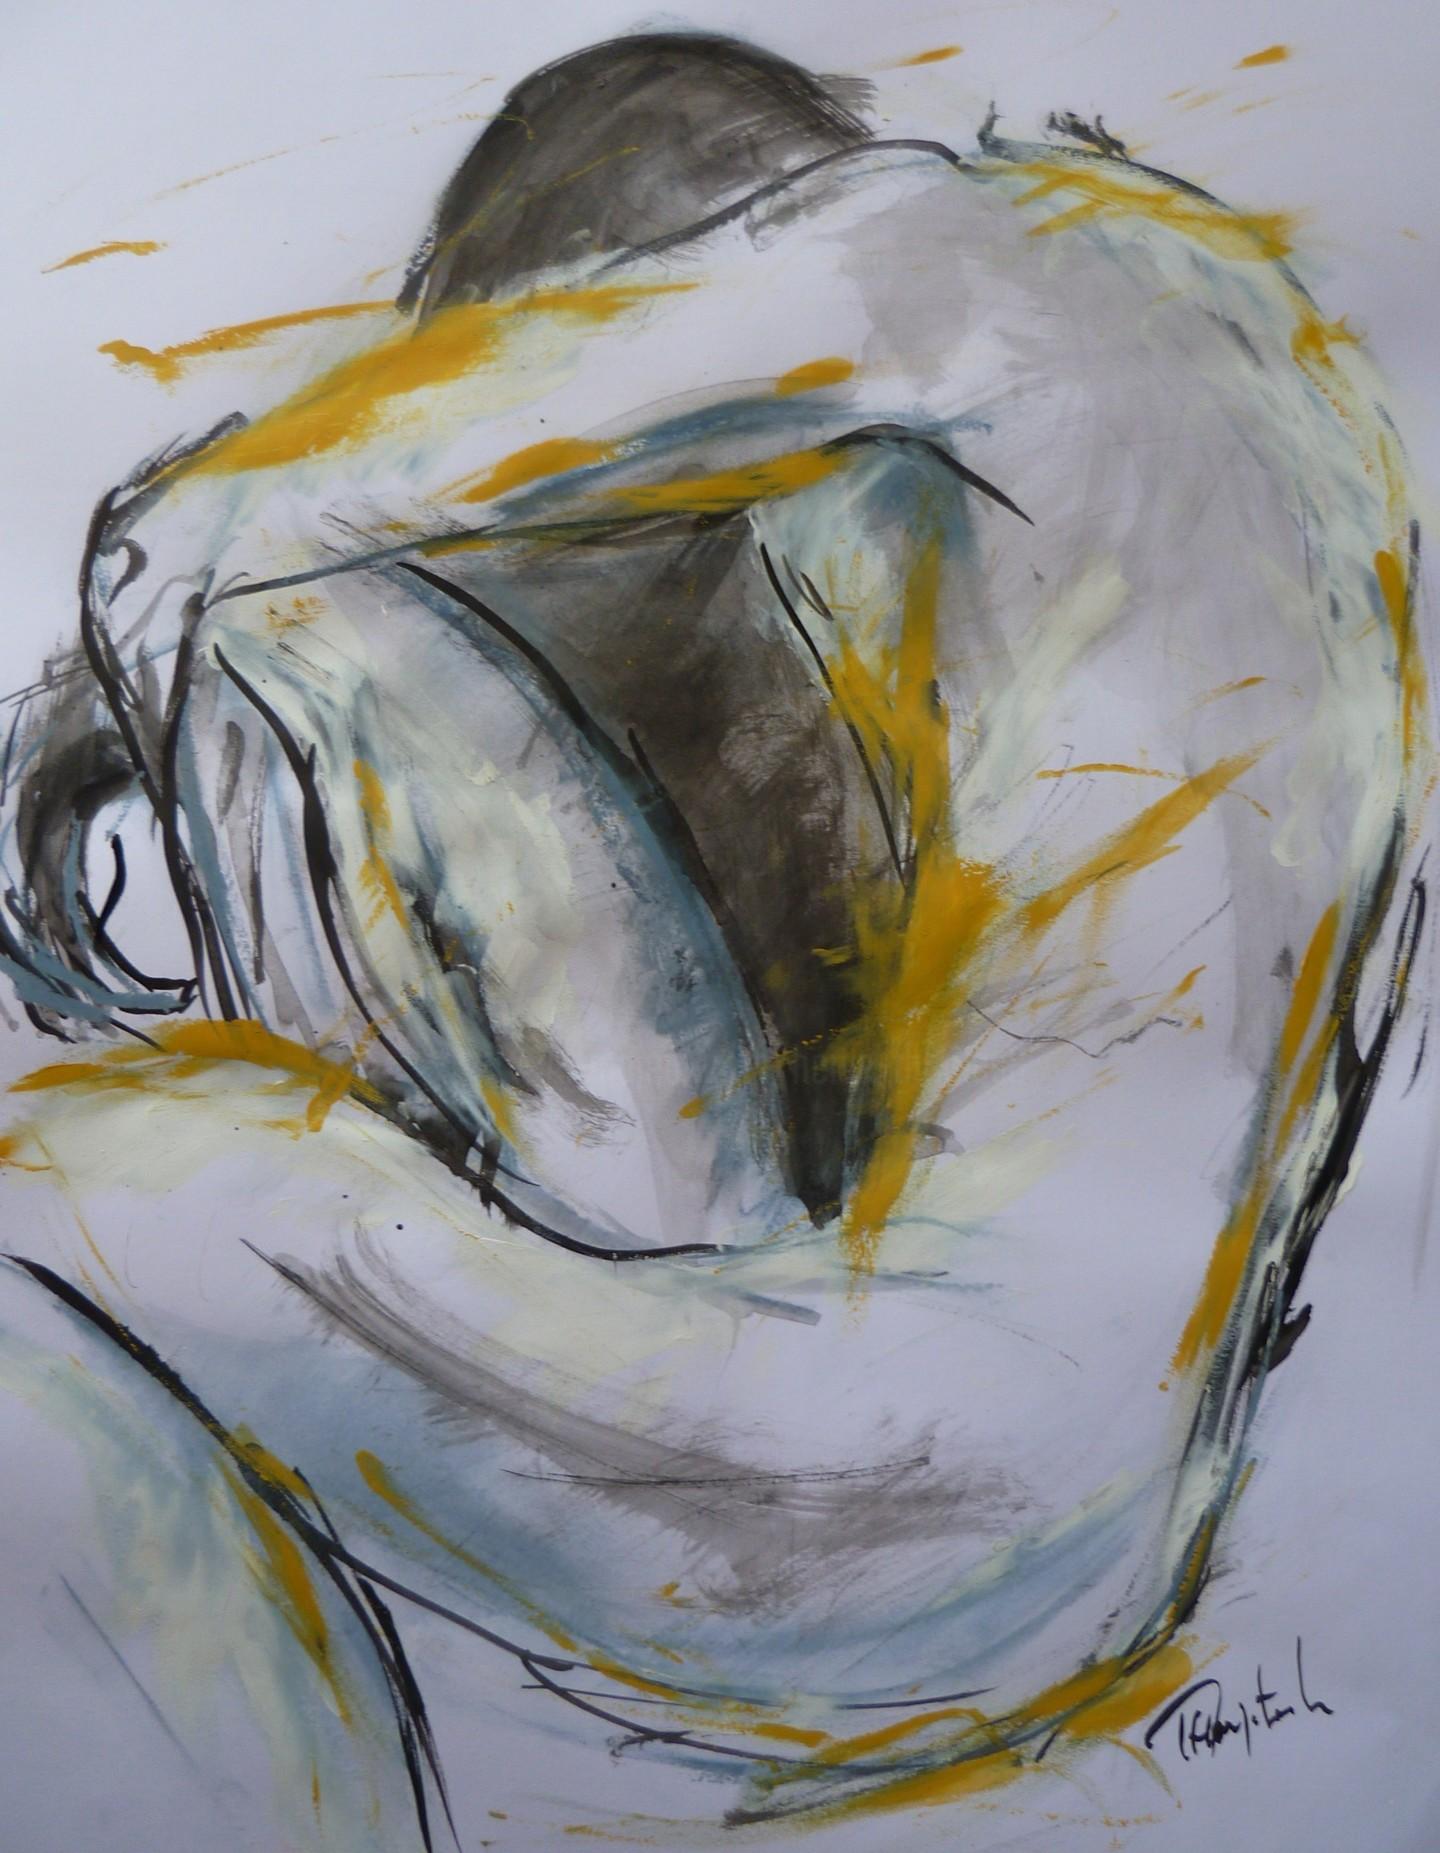 Herve Thomas-Miton - Posture